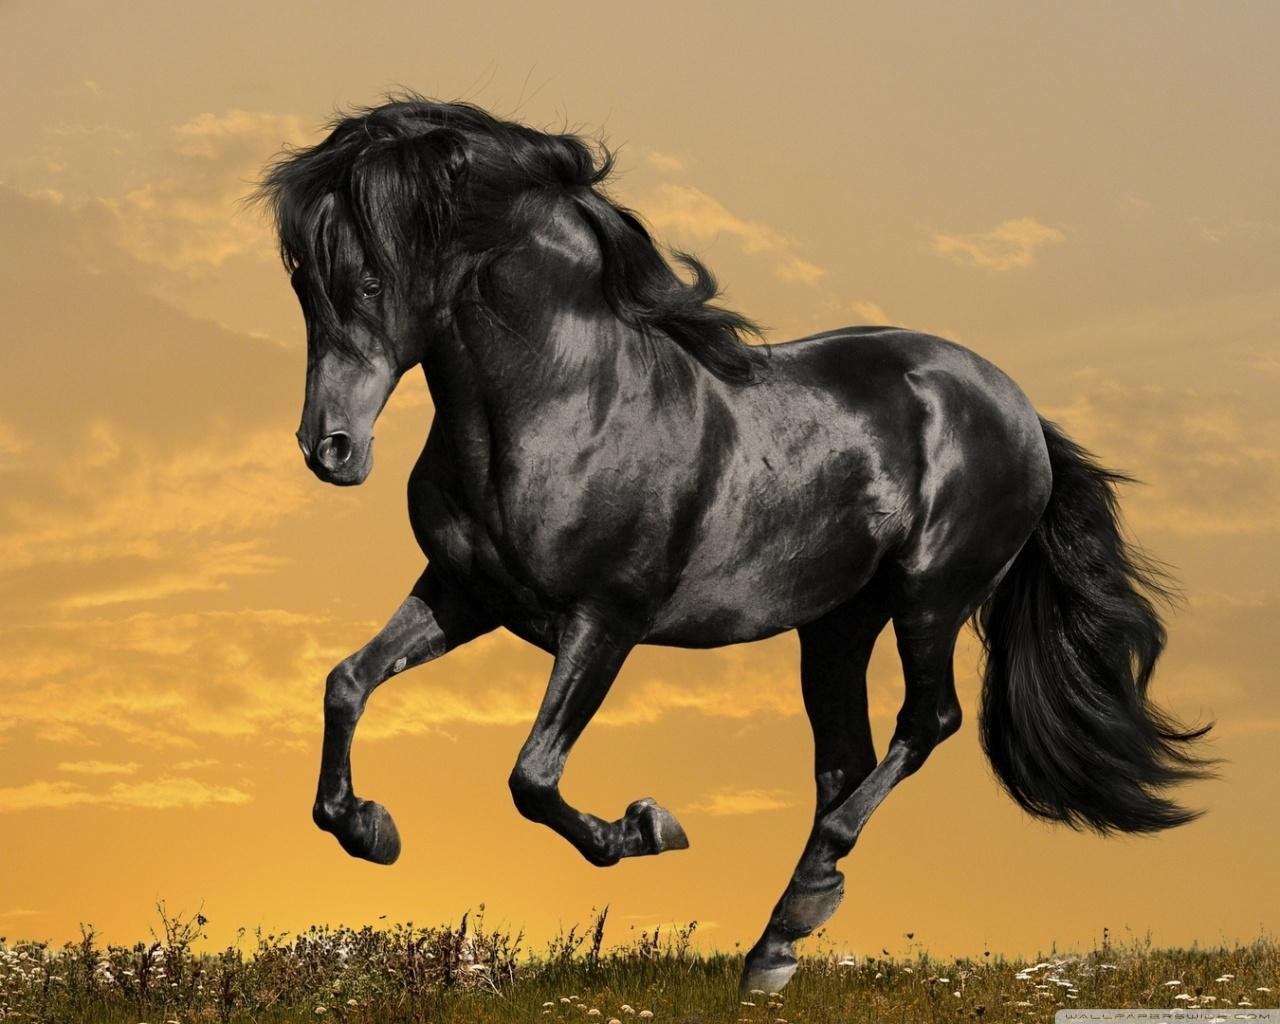 black horse running ❤ uhd desktop wallpaper for ultra hd 4k 8k